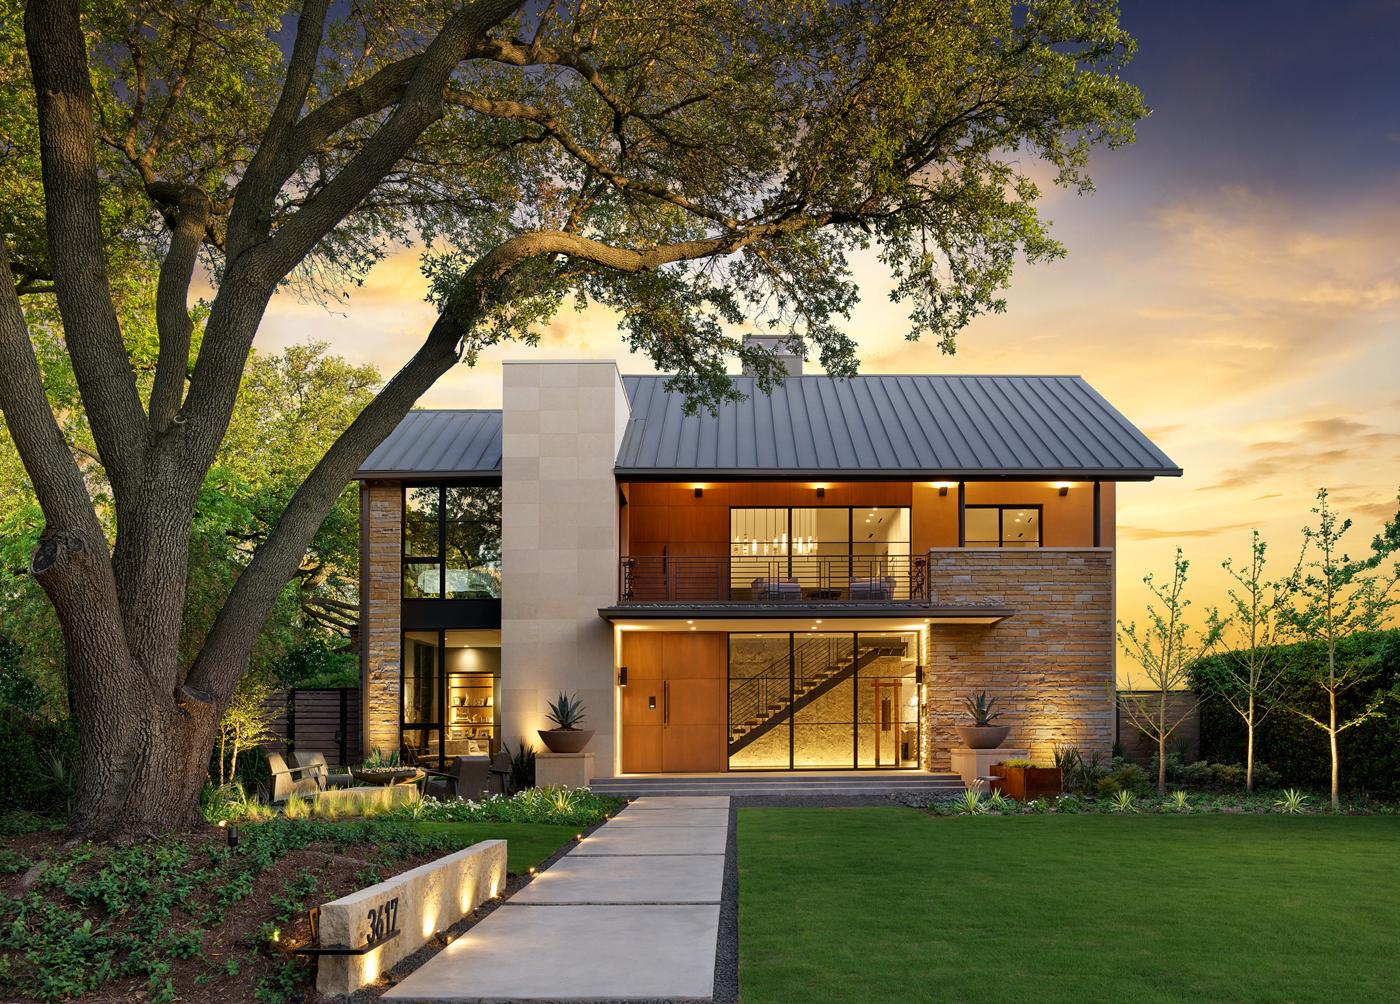 holger-obenaus-architecture-photography-dusk-exterior-bernbaum-magadini